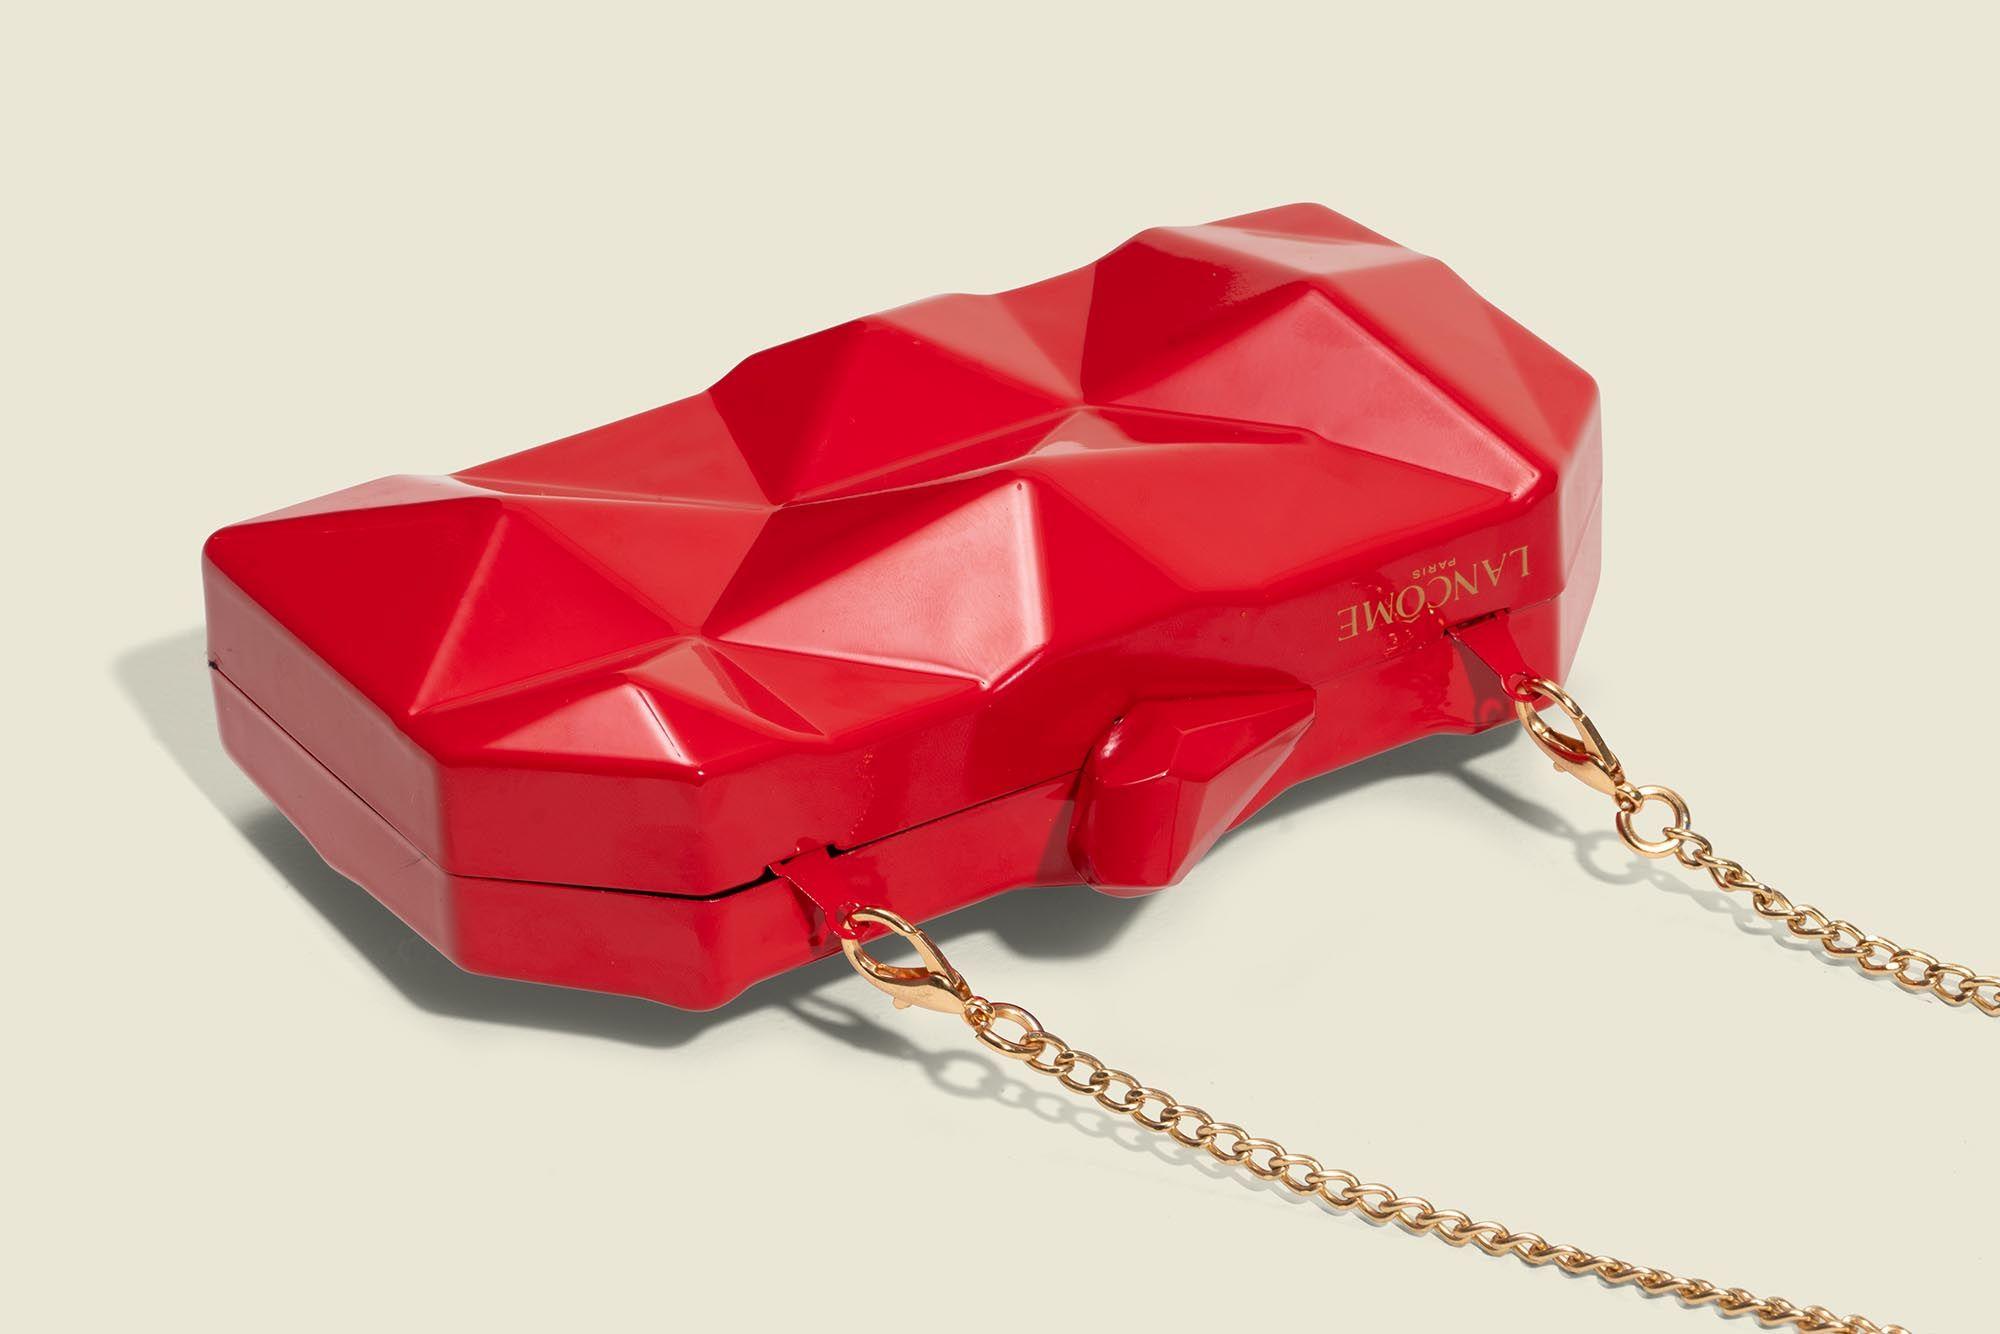 Custom metal bag with chain